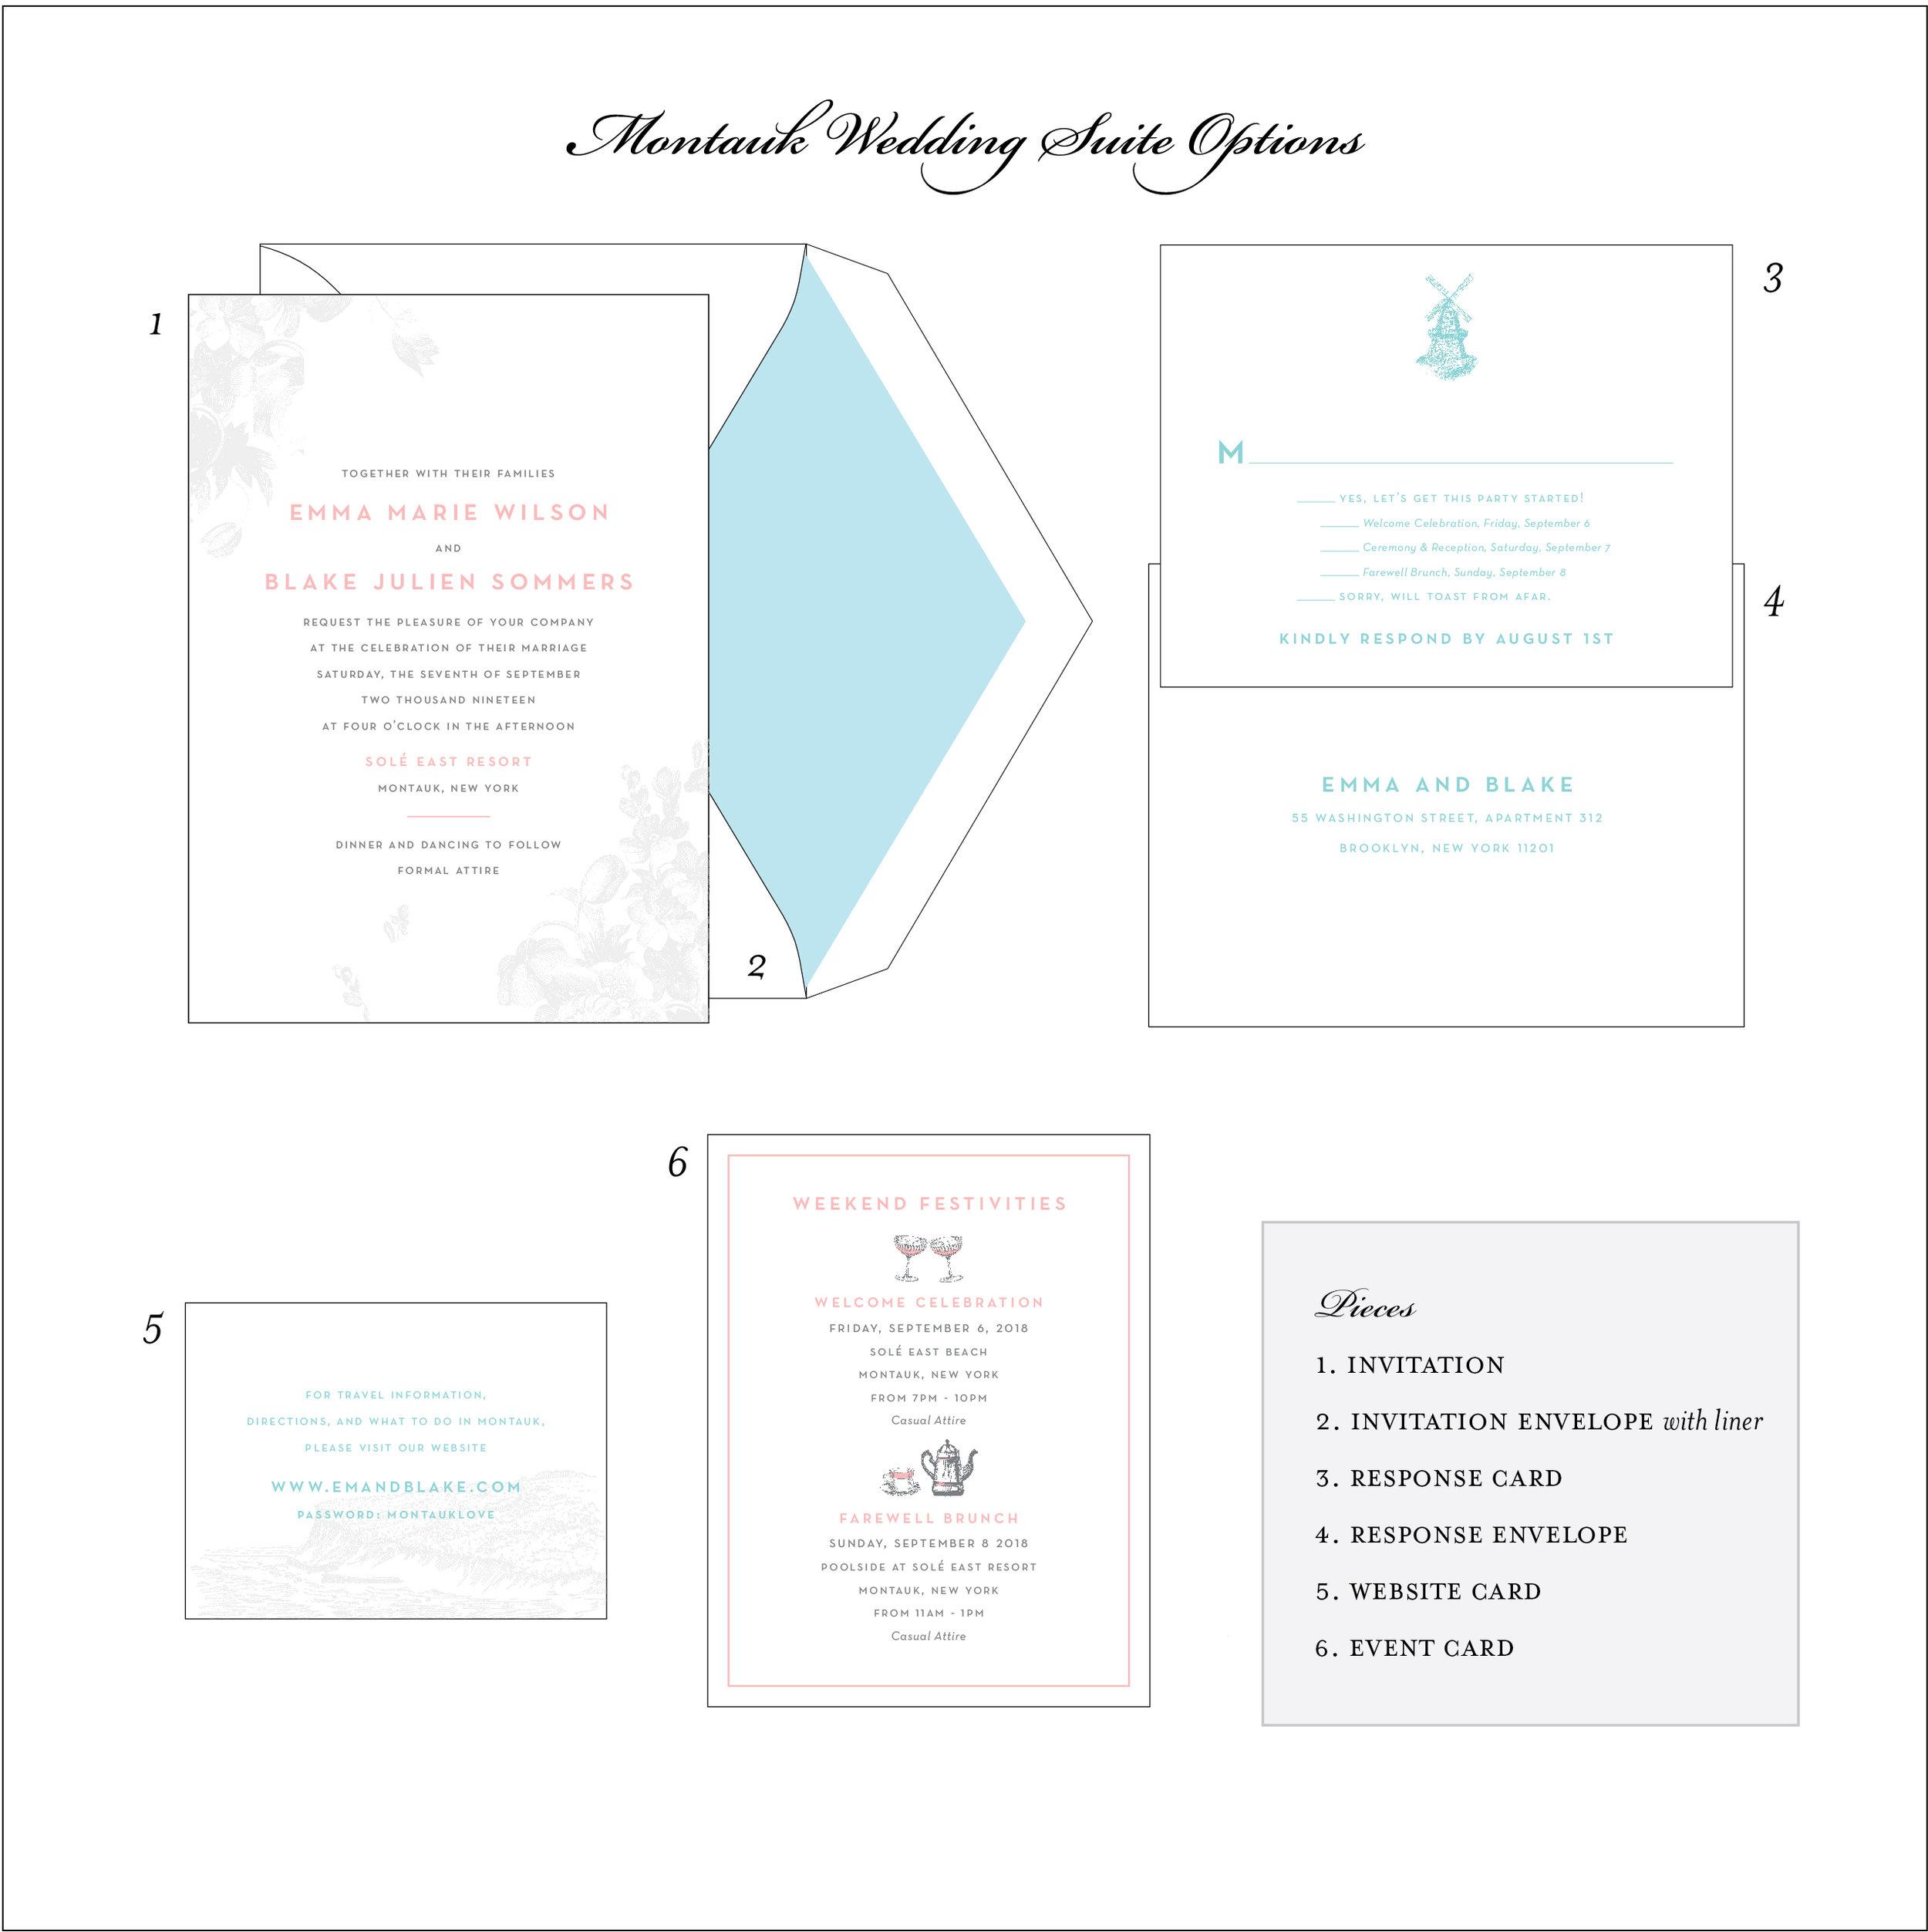 Website_Invite_Options-MONTAUK-A.jpg